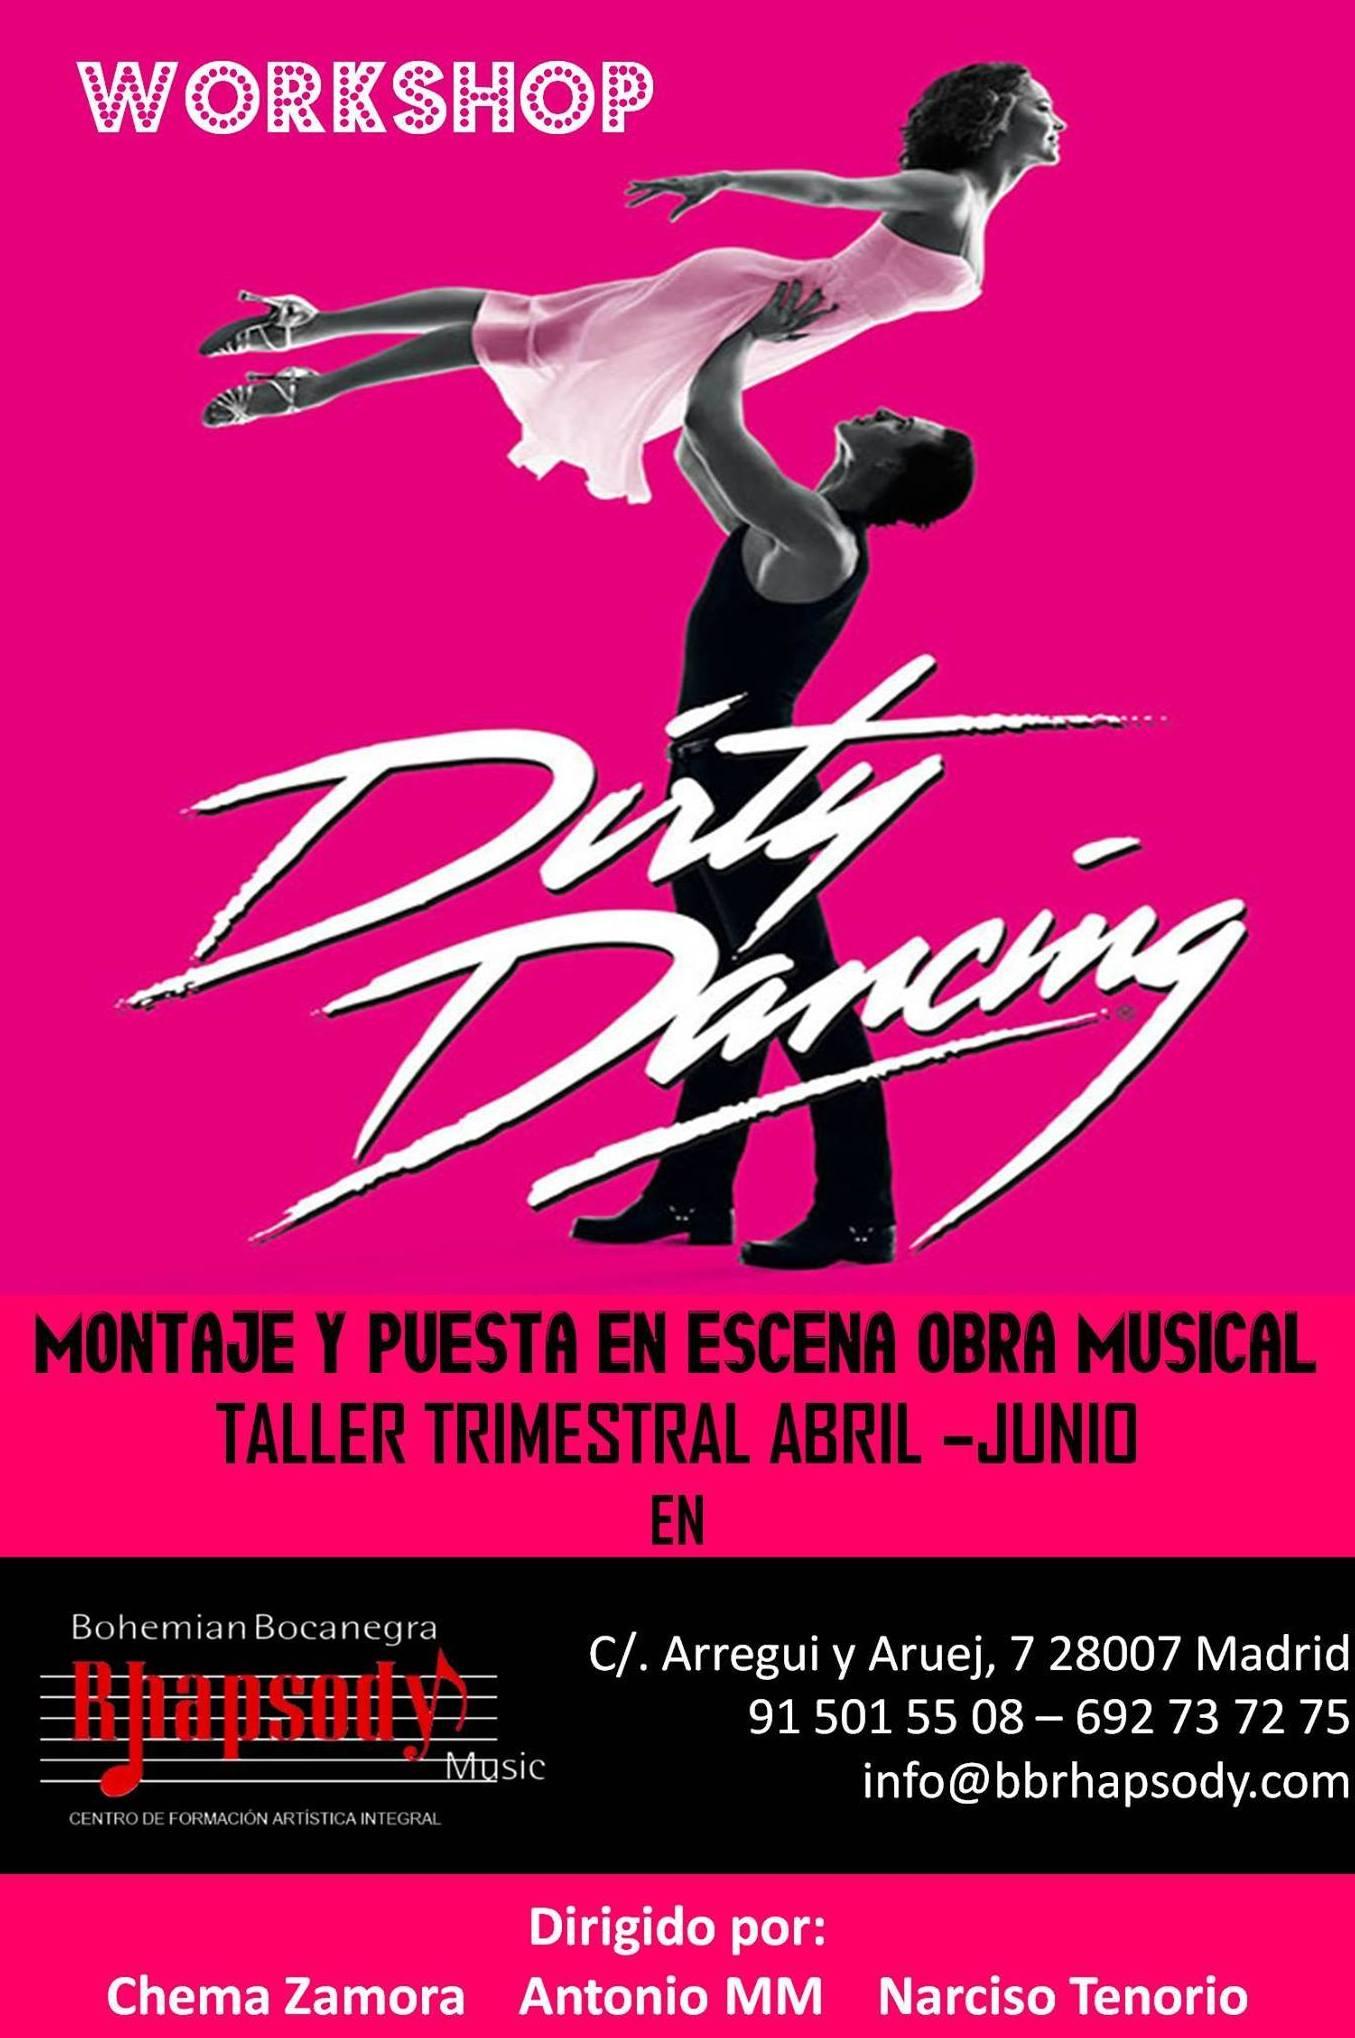 "Workshop ""DIRTY DANCING"" (Montaje de una obra musical): Catálogo formación de Bohemian Bocanegra Rhapsody Music"